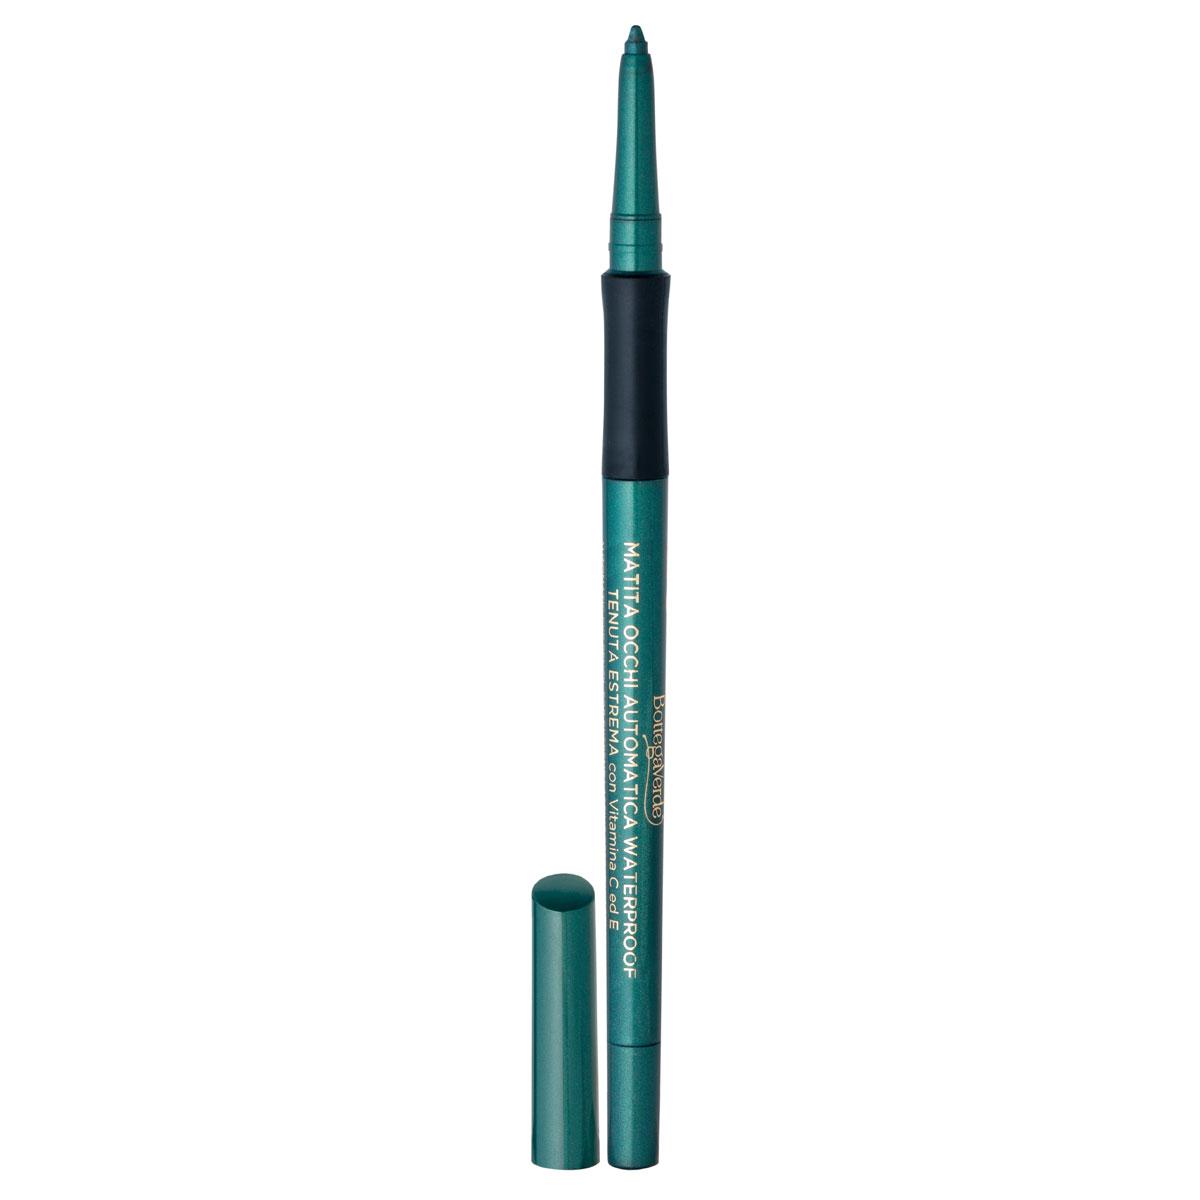 Creion de ochi retractabil, rezistent la apa, cu vitamina C si E imagine